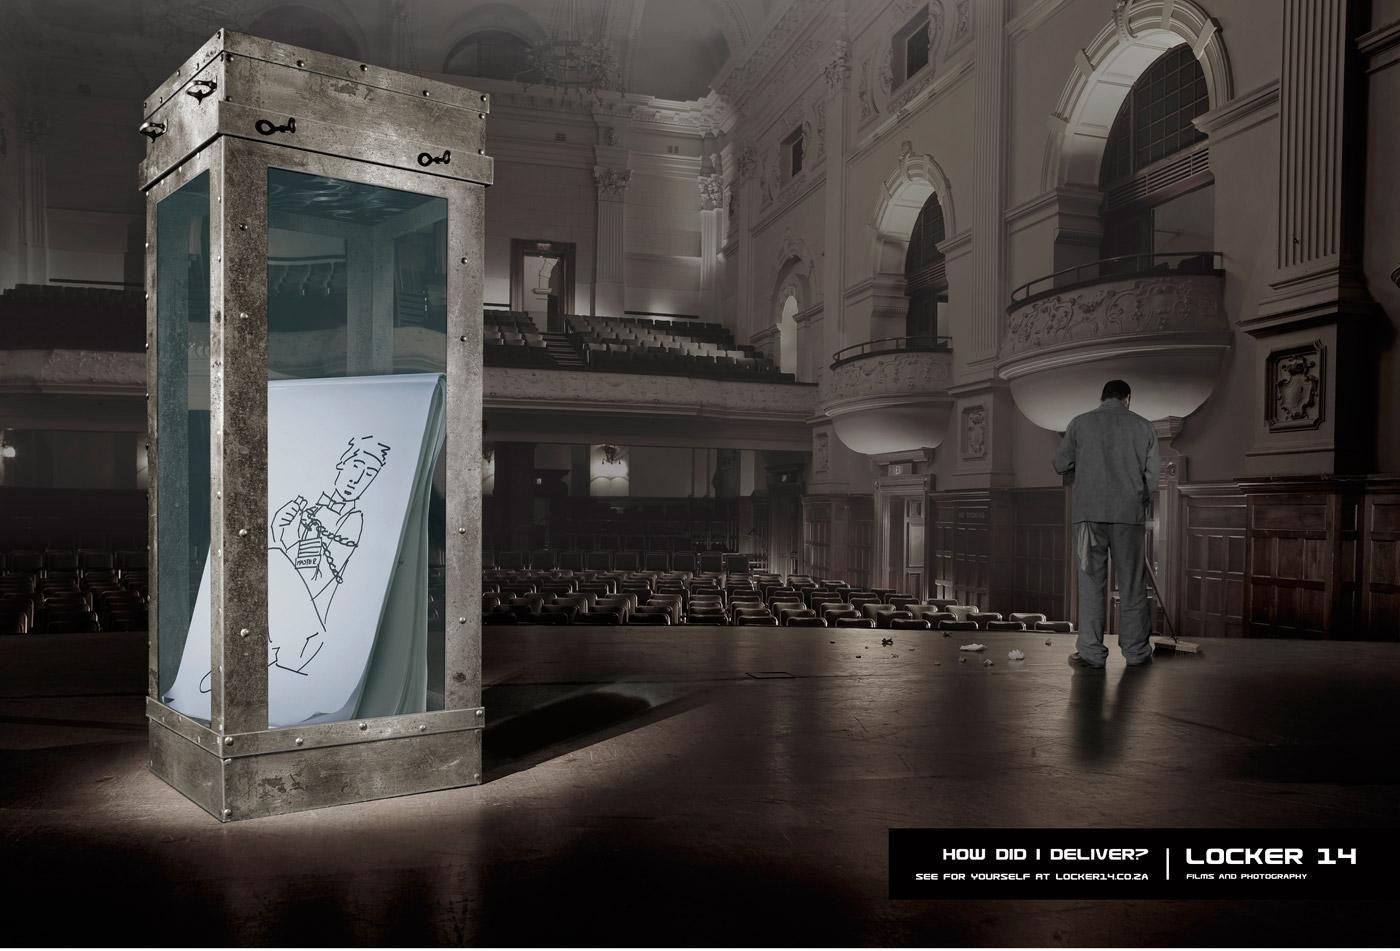 Locker 14 Print Ad -  Houdini